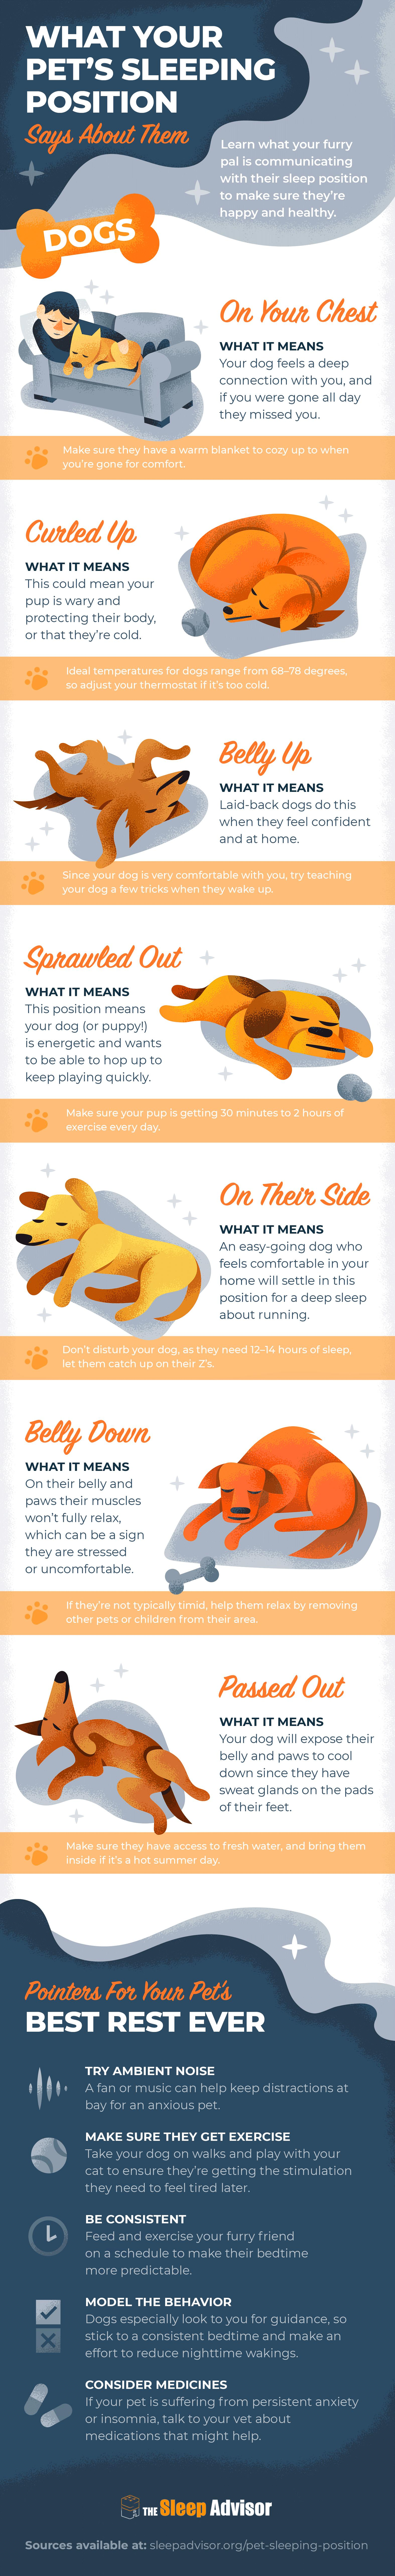 Dog sleep position infographic